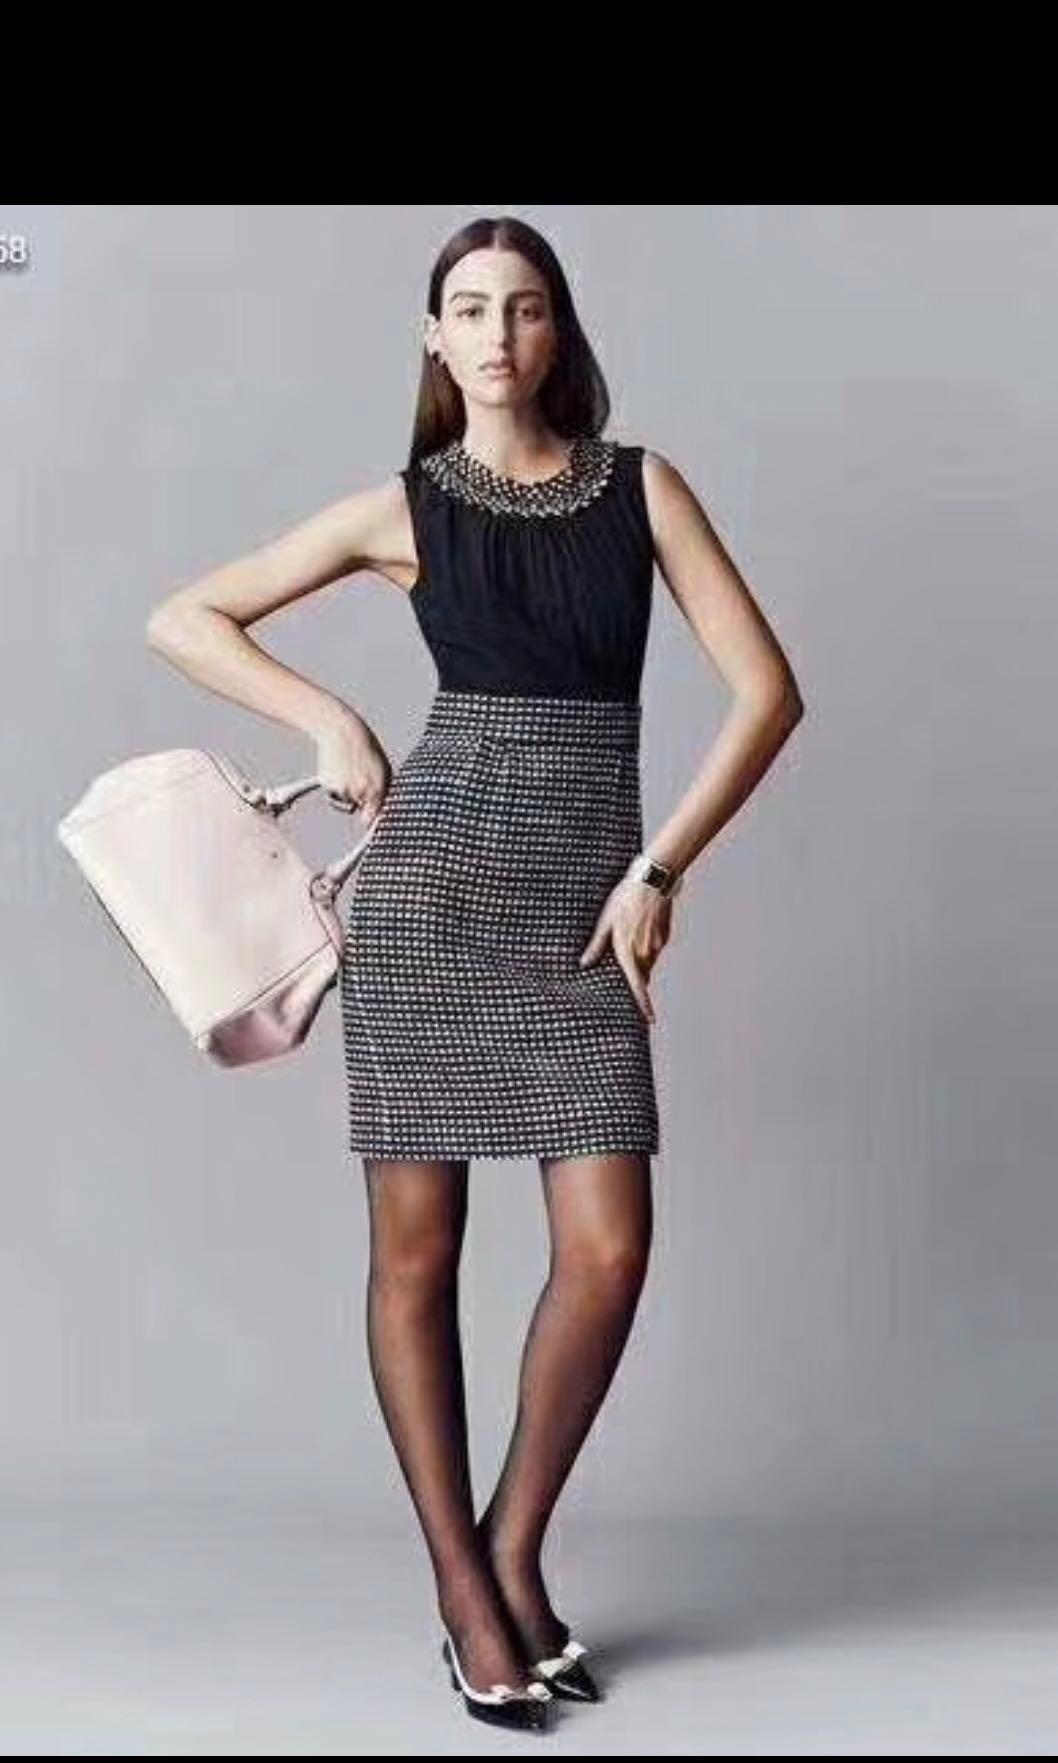 ae45334390c2 BNWT Kate Spade Swarovski Encrusted Neck Tweed Skirt Dress, Women's ...